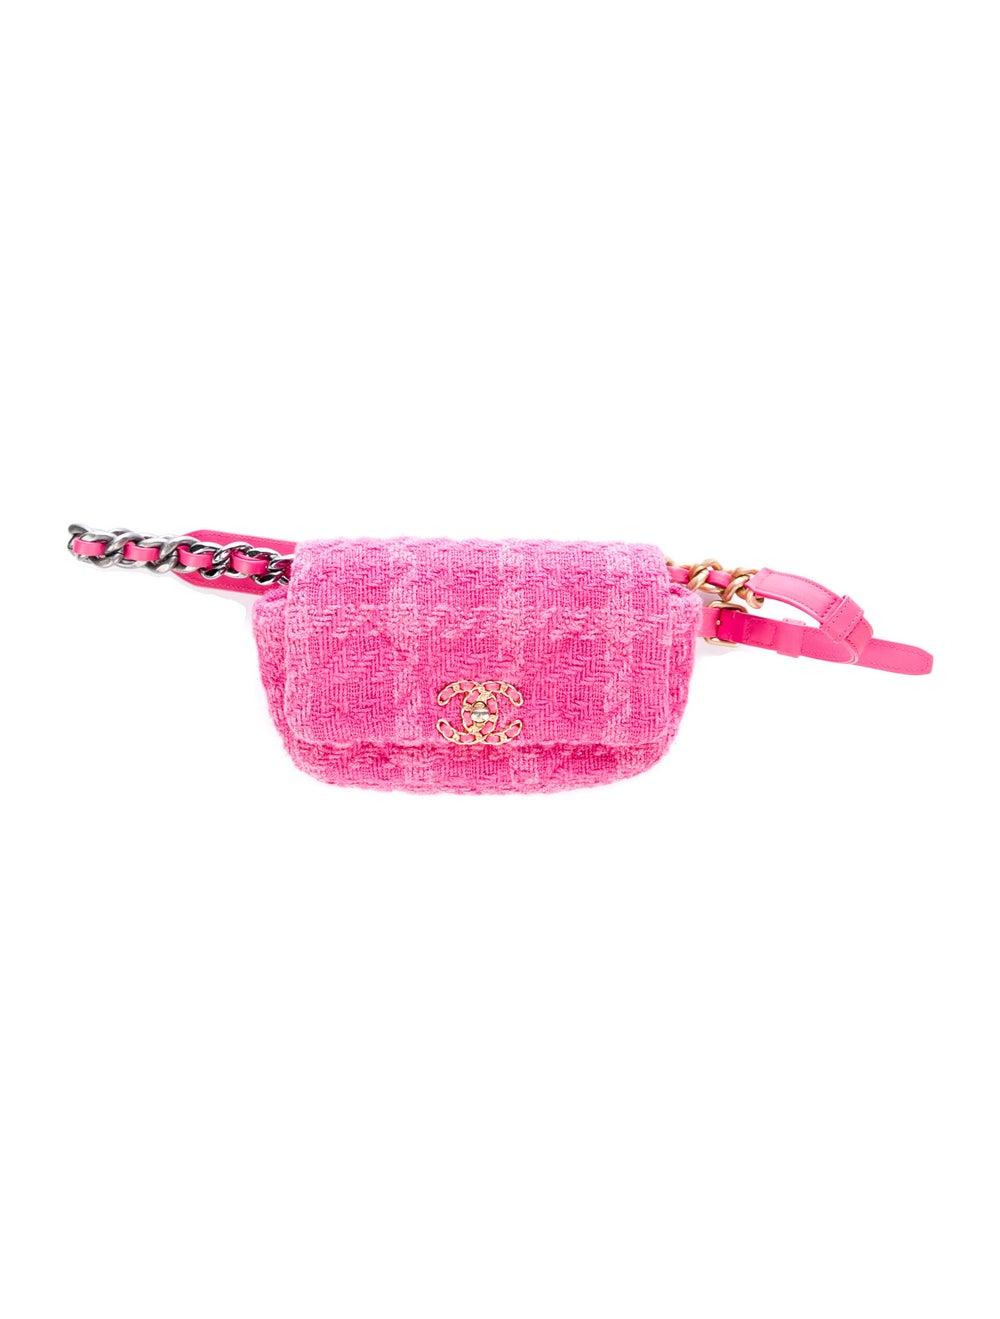 Chanel Tweed 19 Waist Bag Pink - image 1